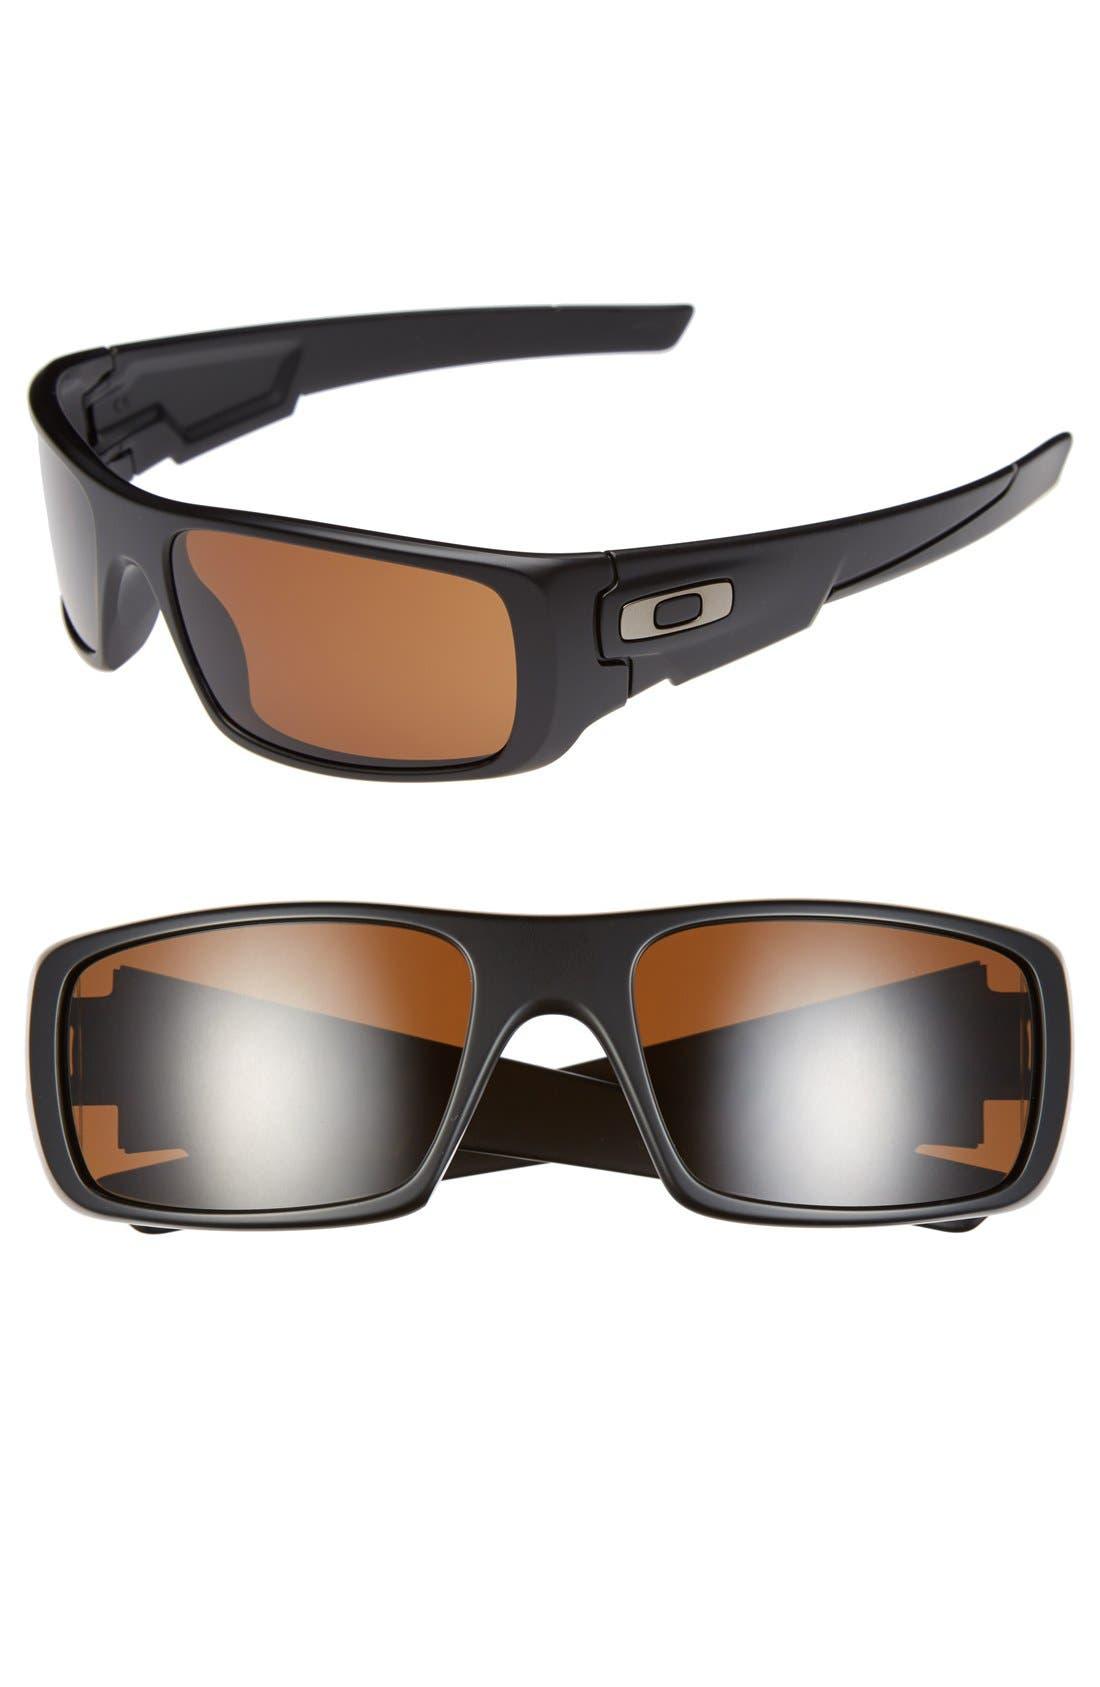 Image of Oakley 'Crankshaft' 60mm Sunglasses